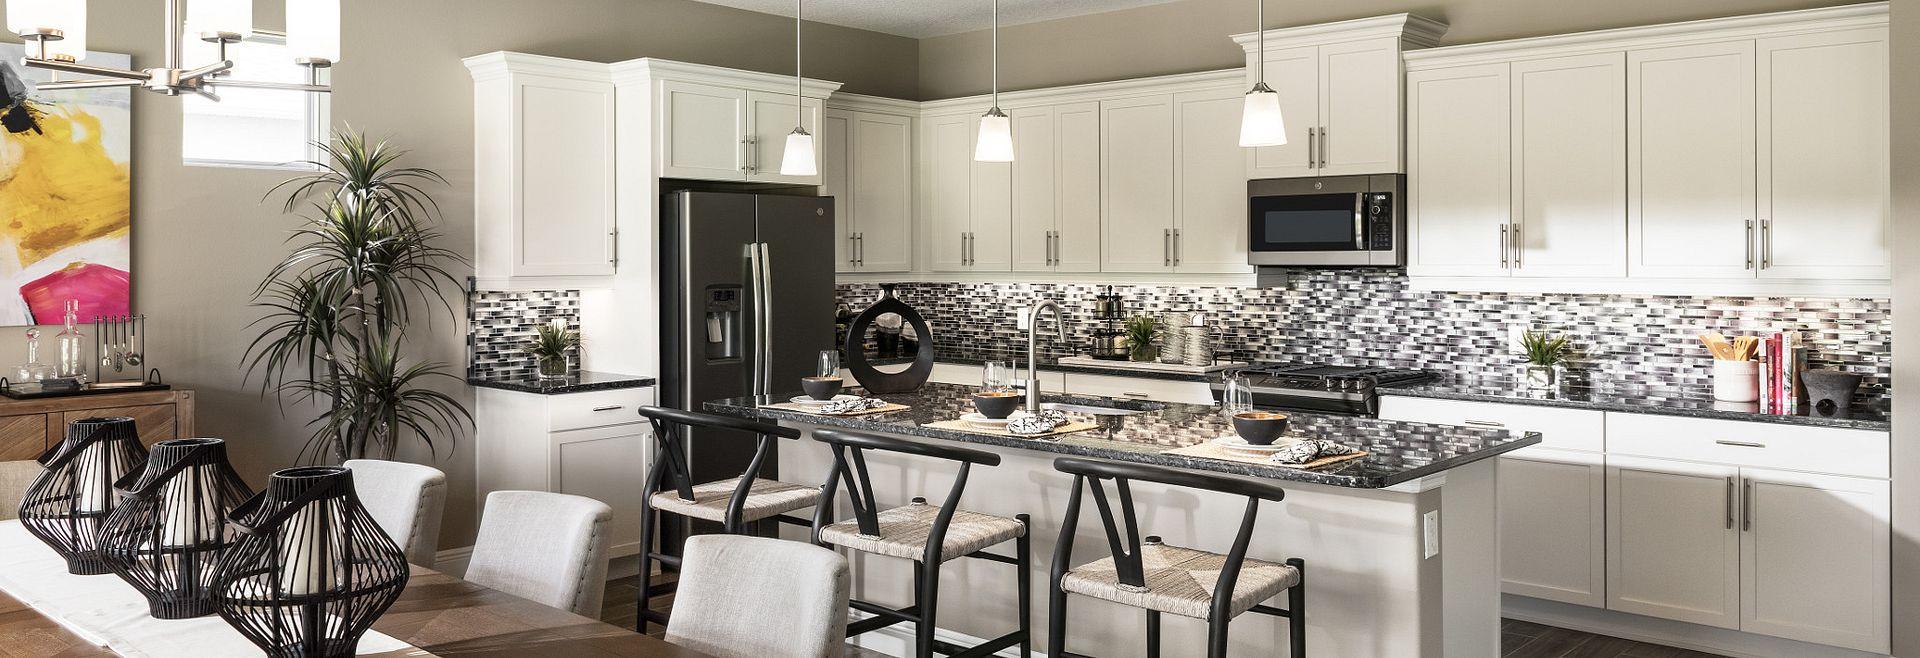 Trilogy at Ocala Preserve Liberty Model Home Kitchen